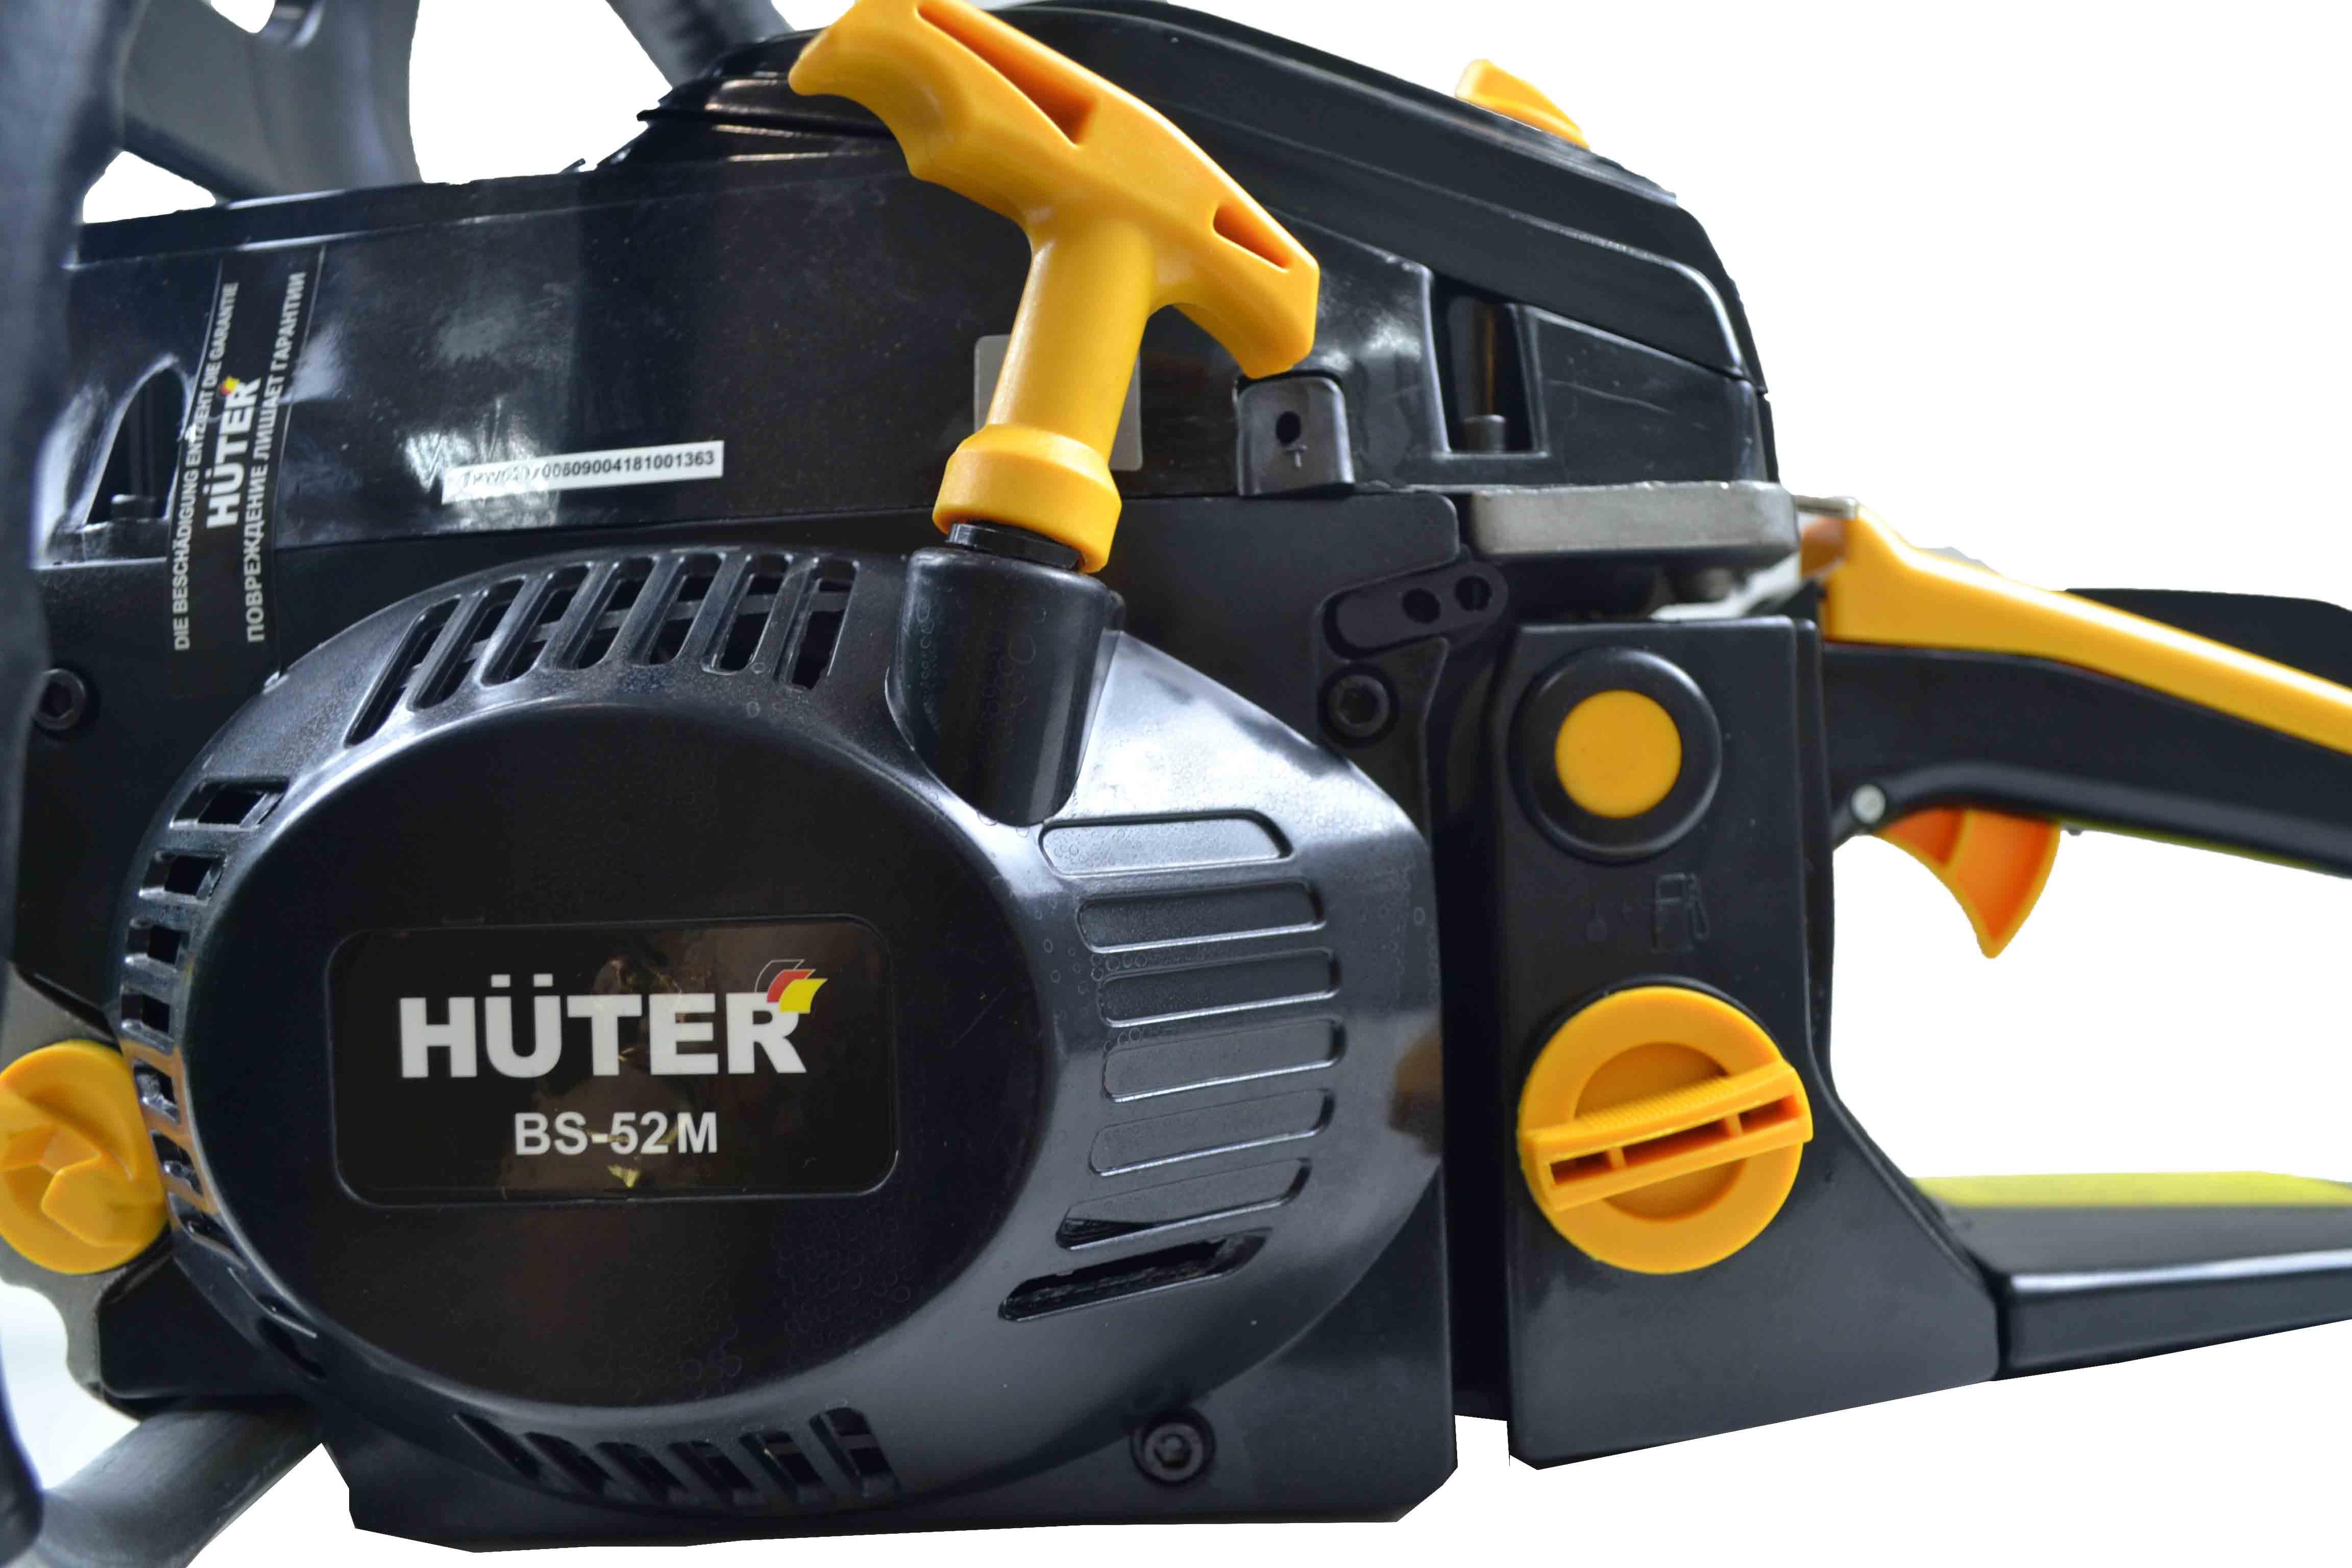 Бензопила huter bs-40: характеристики, отзывы, цена, аналоги